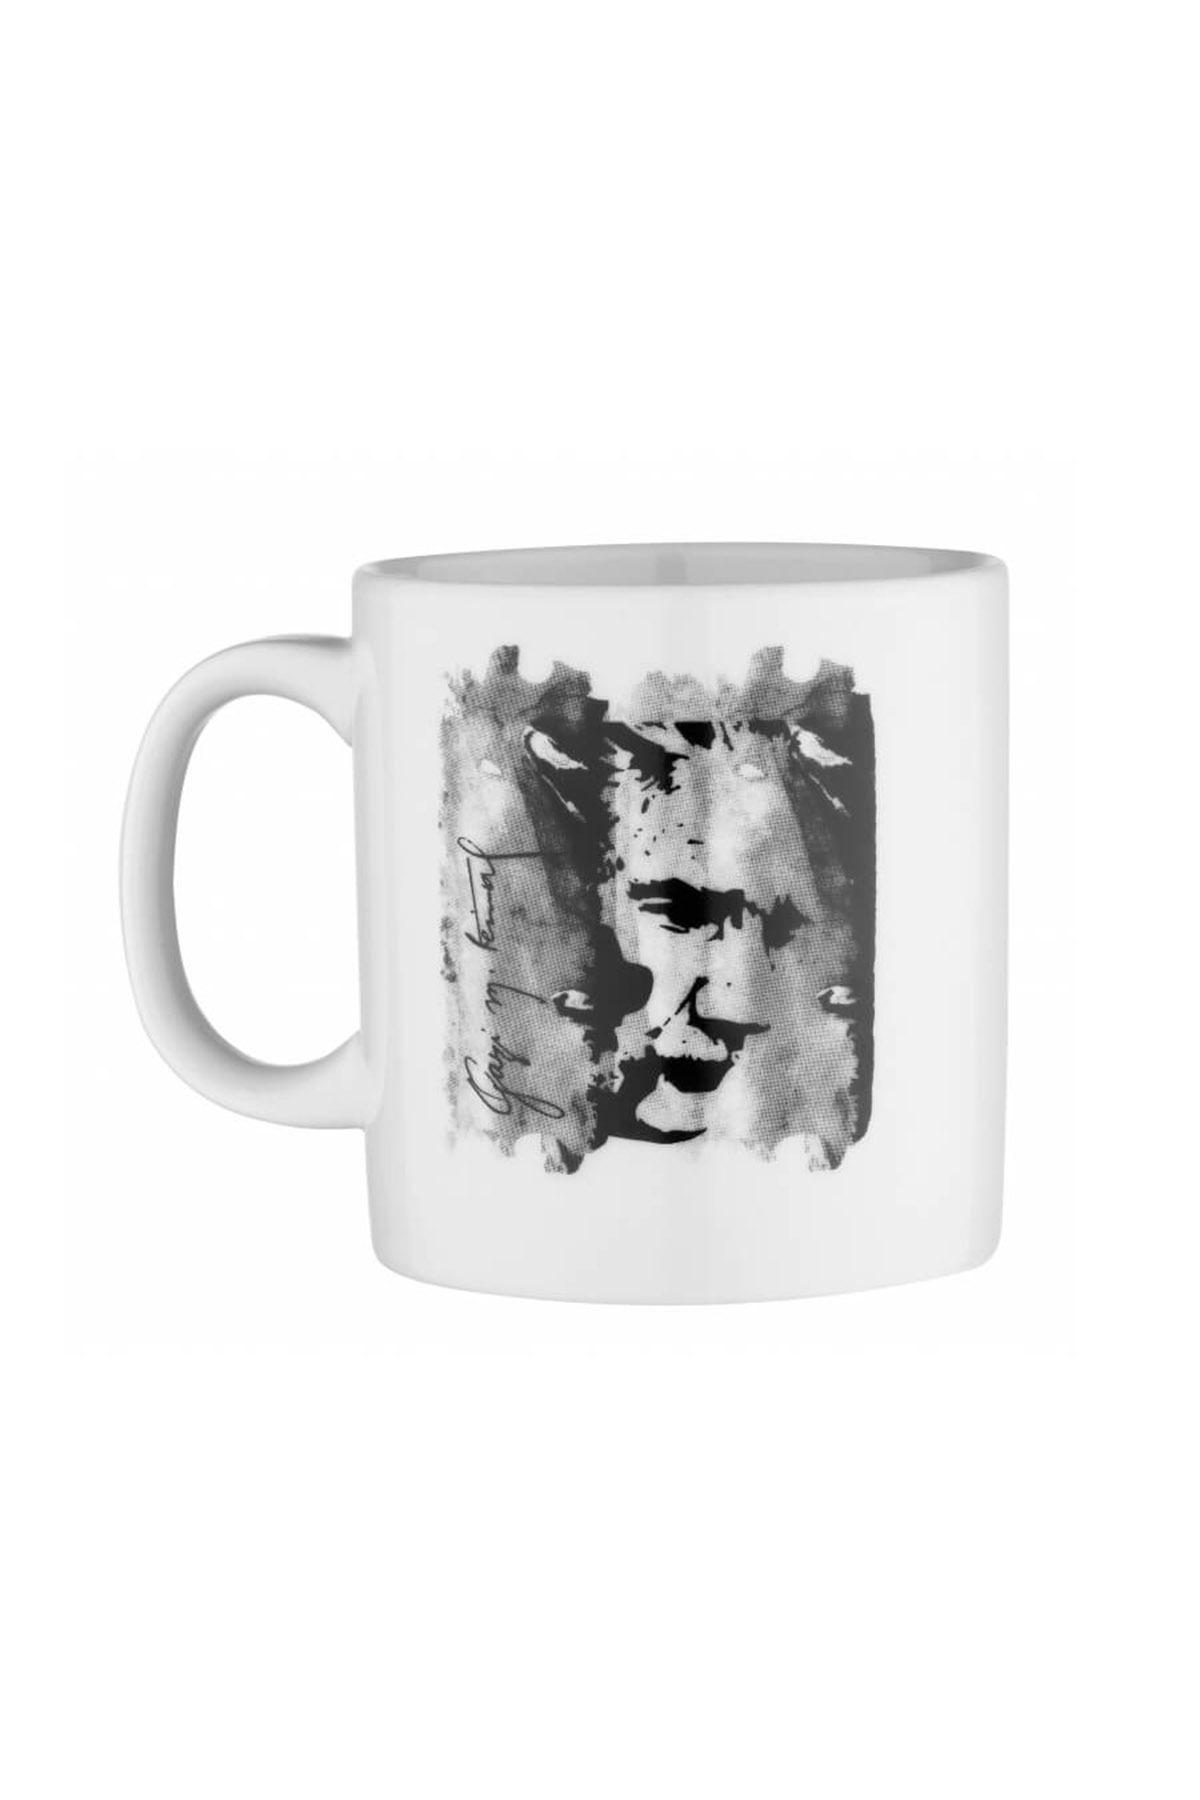 Kütahya Porselen - Kütahya Porselen Mug Bardak Special Coll. Atatürk 10430